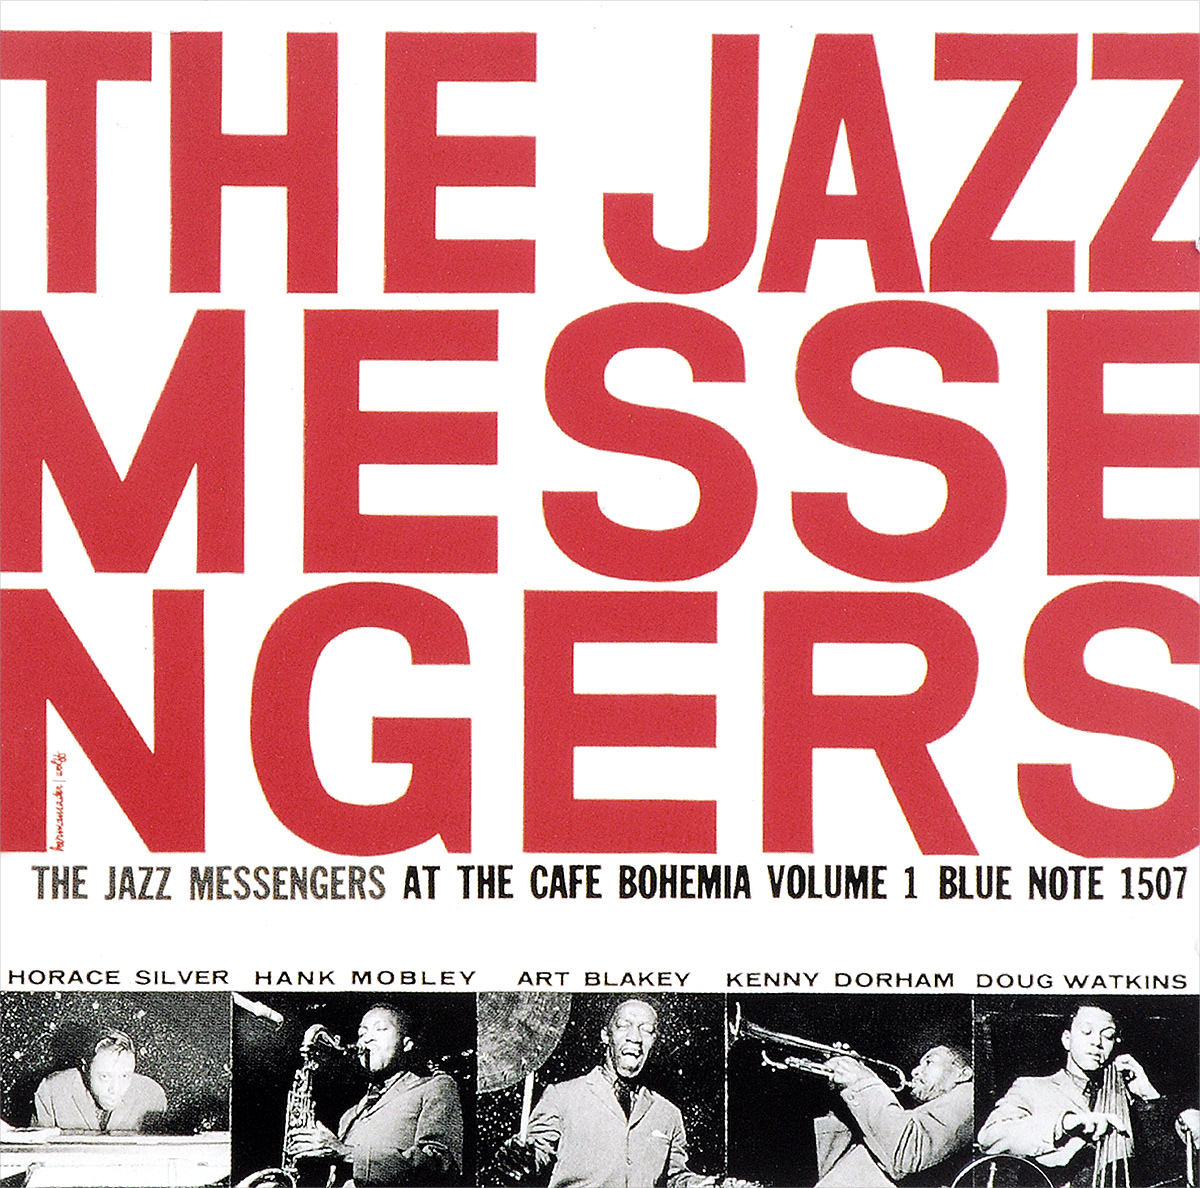 Арт Блэйки,The Jazz Messengers,Кенни Дорхэм,Хэнк Мобли,Хорэс Сильвер,Дуг Уоткинс Art Blakey & The Jazz Messengers. At The Cafe Bohemia, Volume 1 art blakey quintet art blakey quintet a night at birdland volume 2 lp